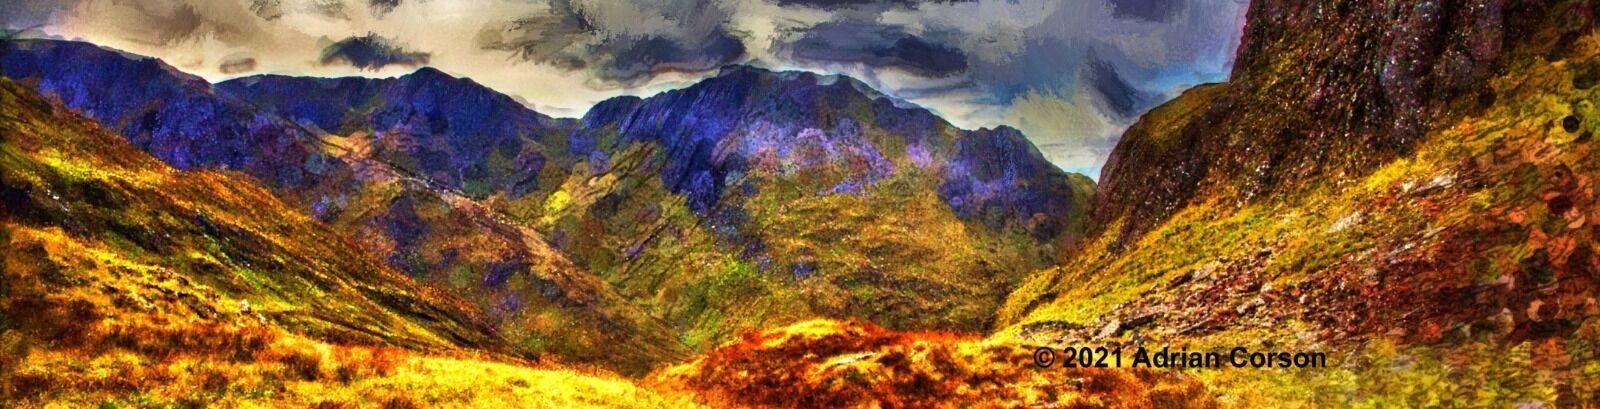 108-mountain pass